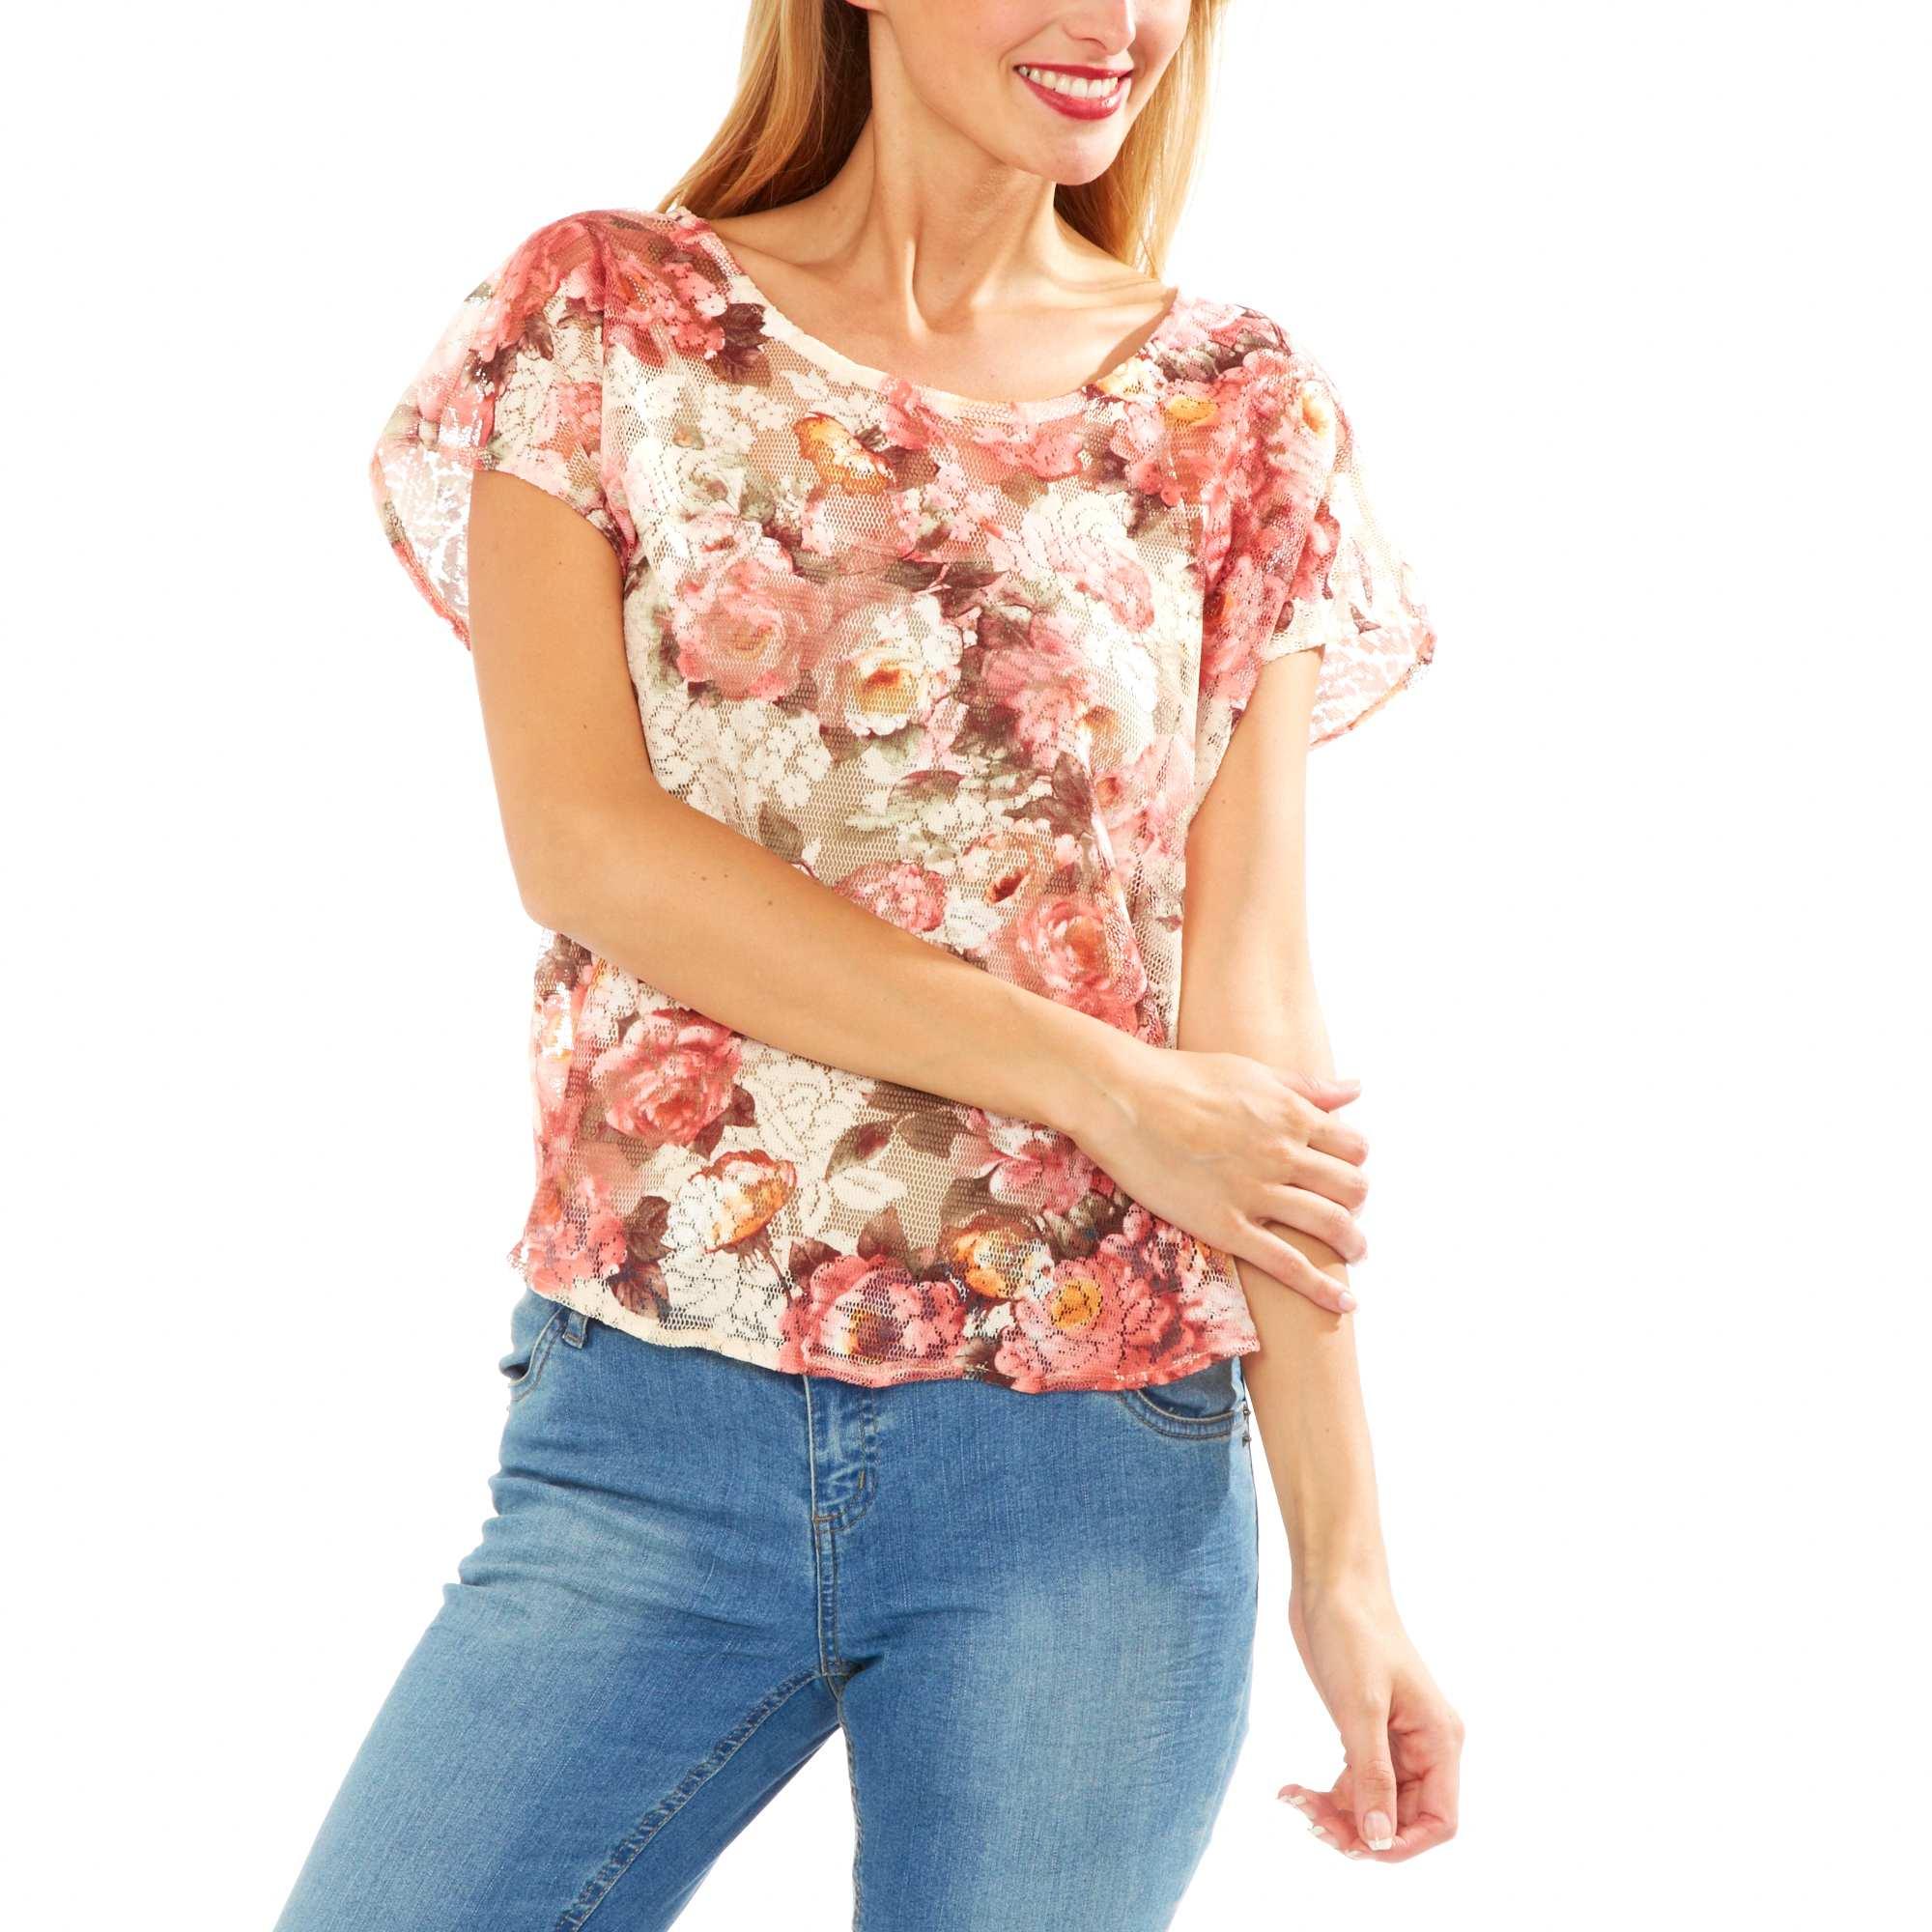 tee shirt femme un accessoire feminin pas cher. Black Bedroom Furniture Sets. Home Design Ideas